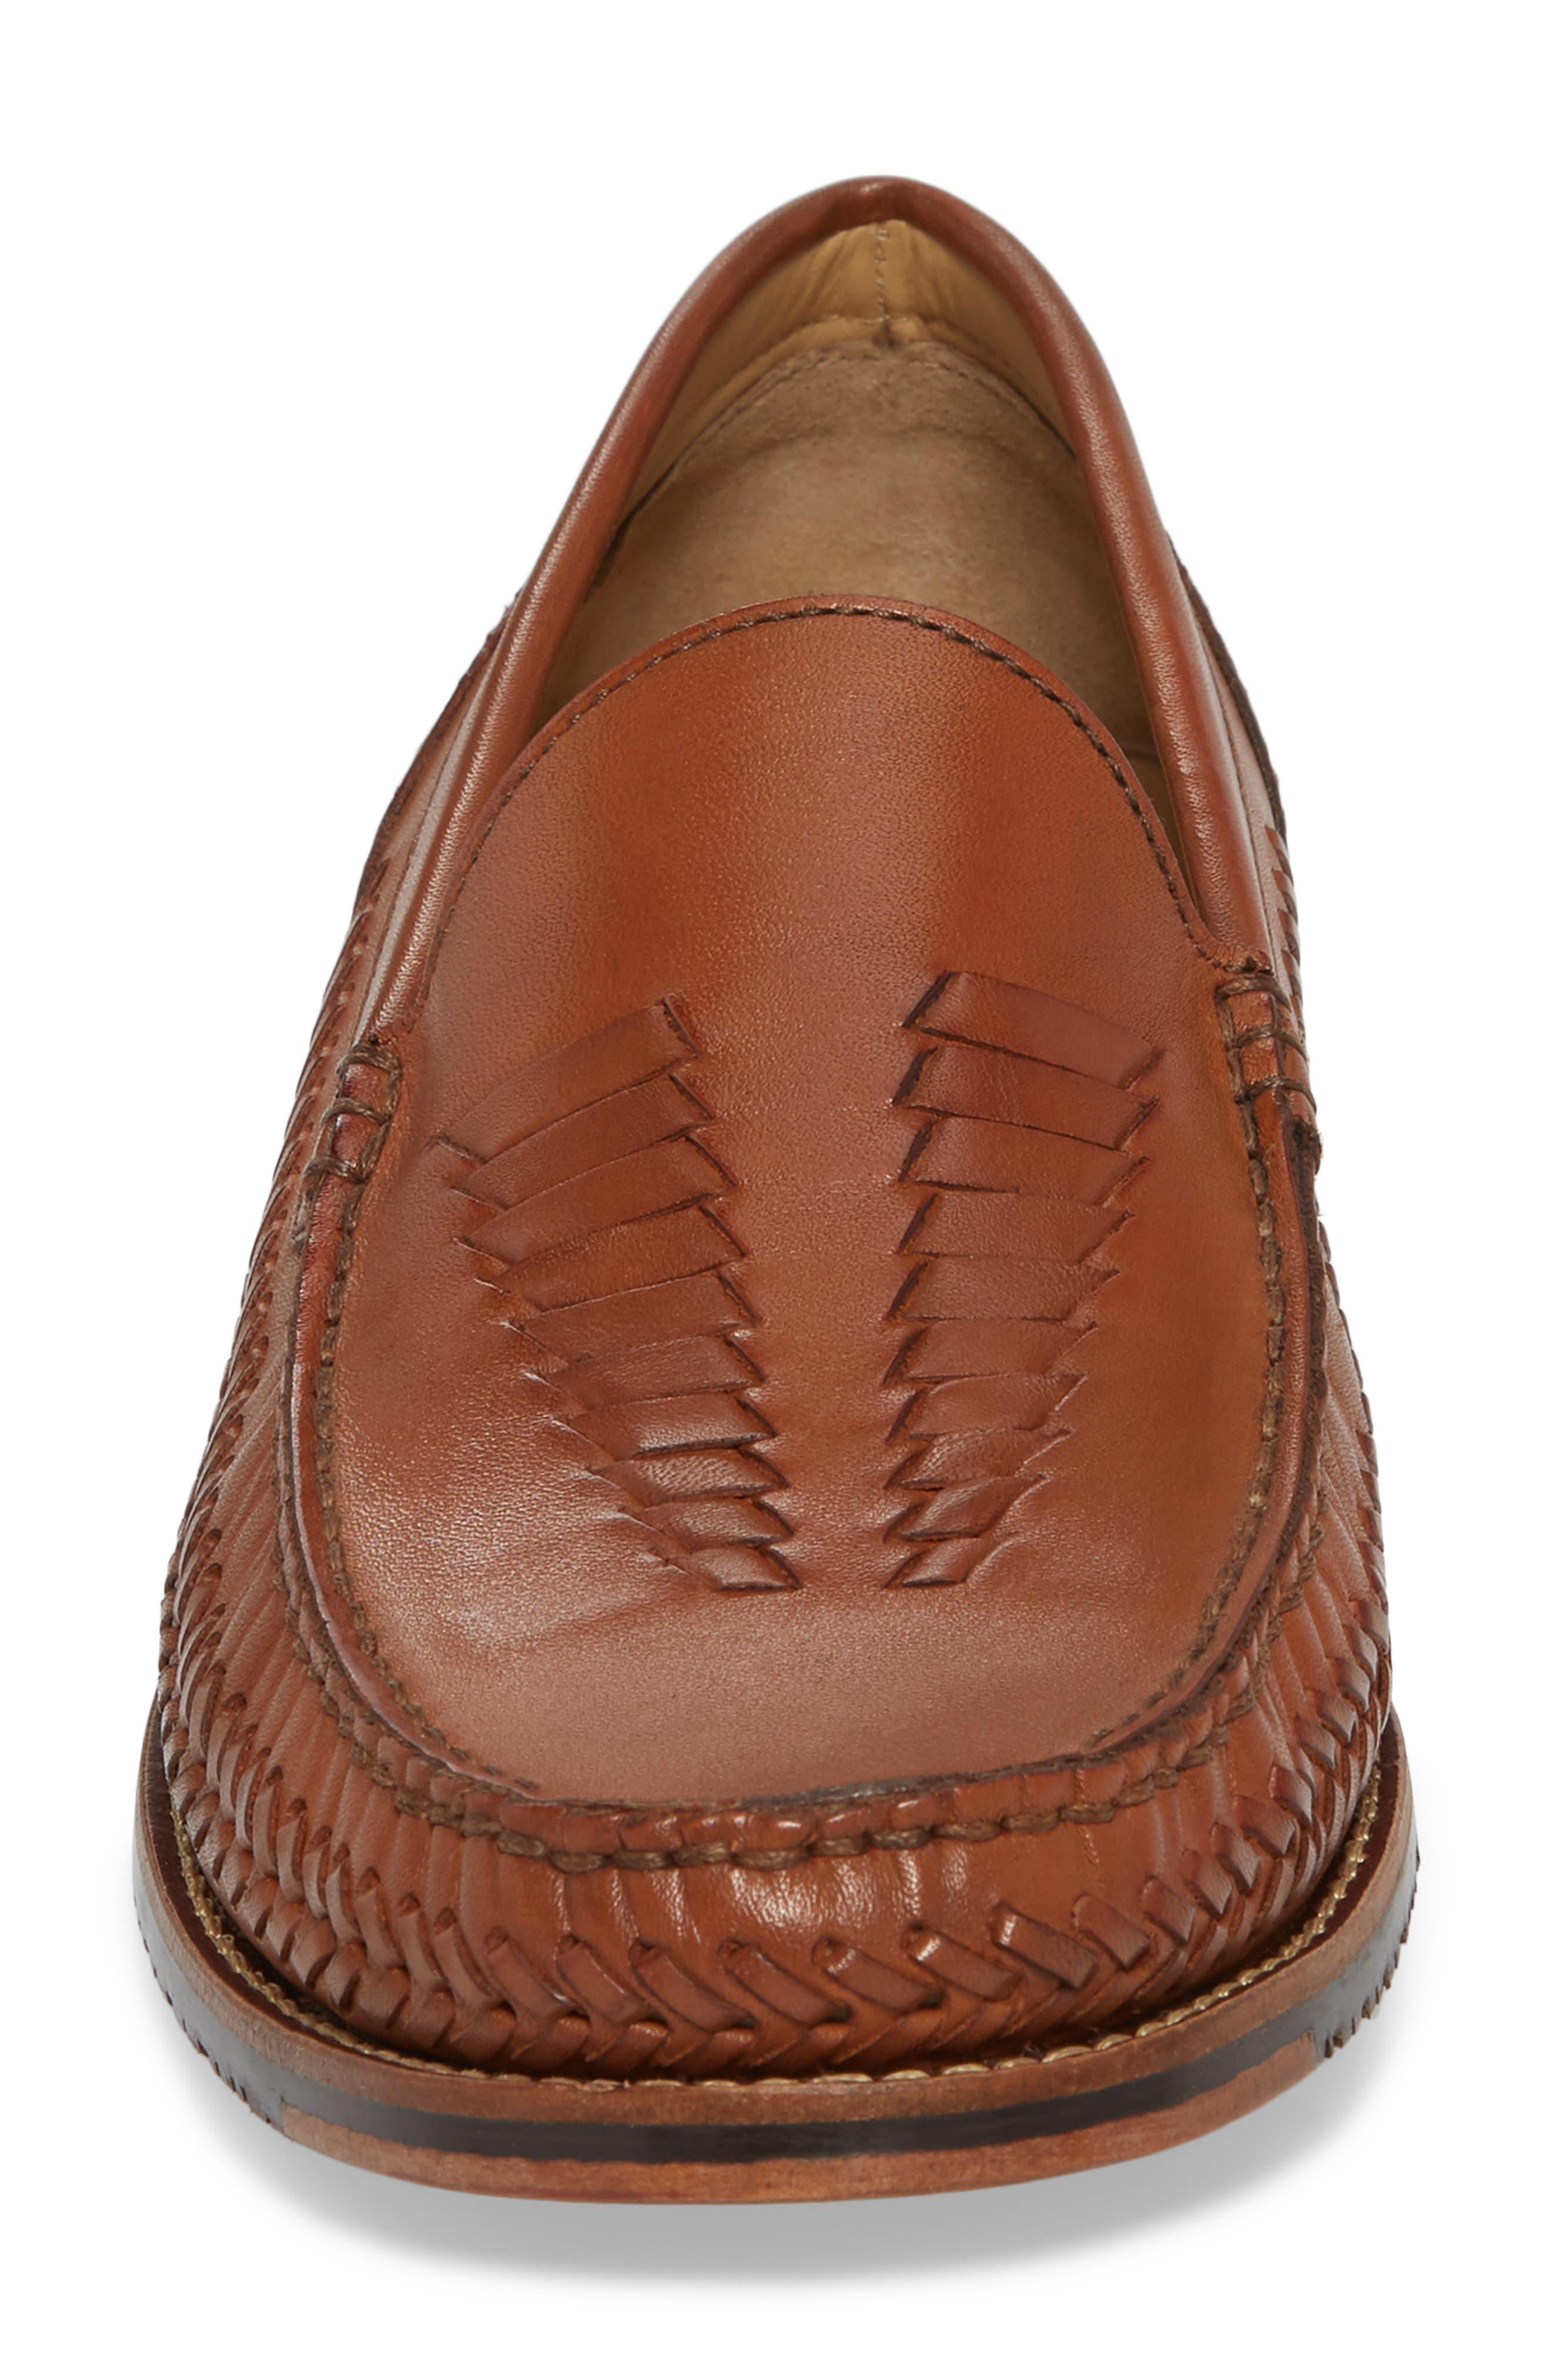 Hasslington Woven Venetian Loafer,                             Alternate thumbnail 4, color,                             Tan Leather